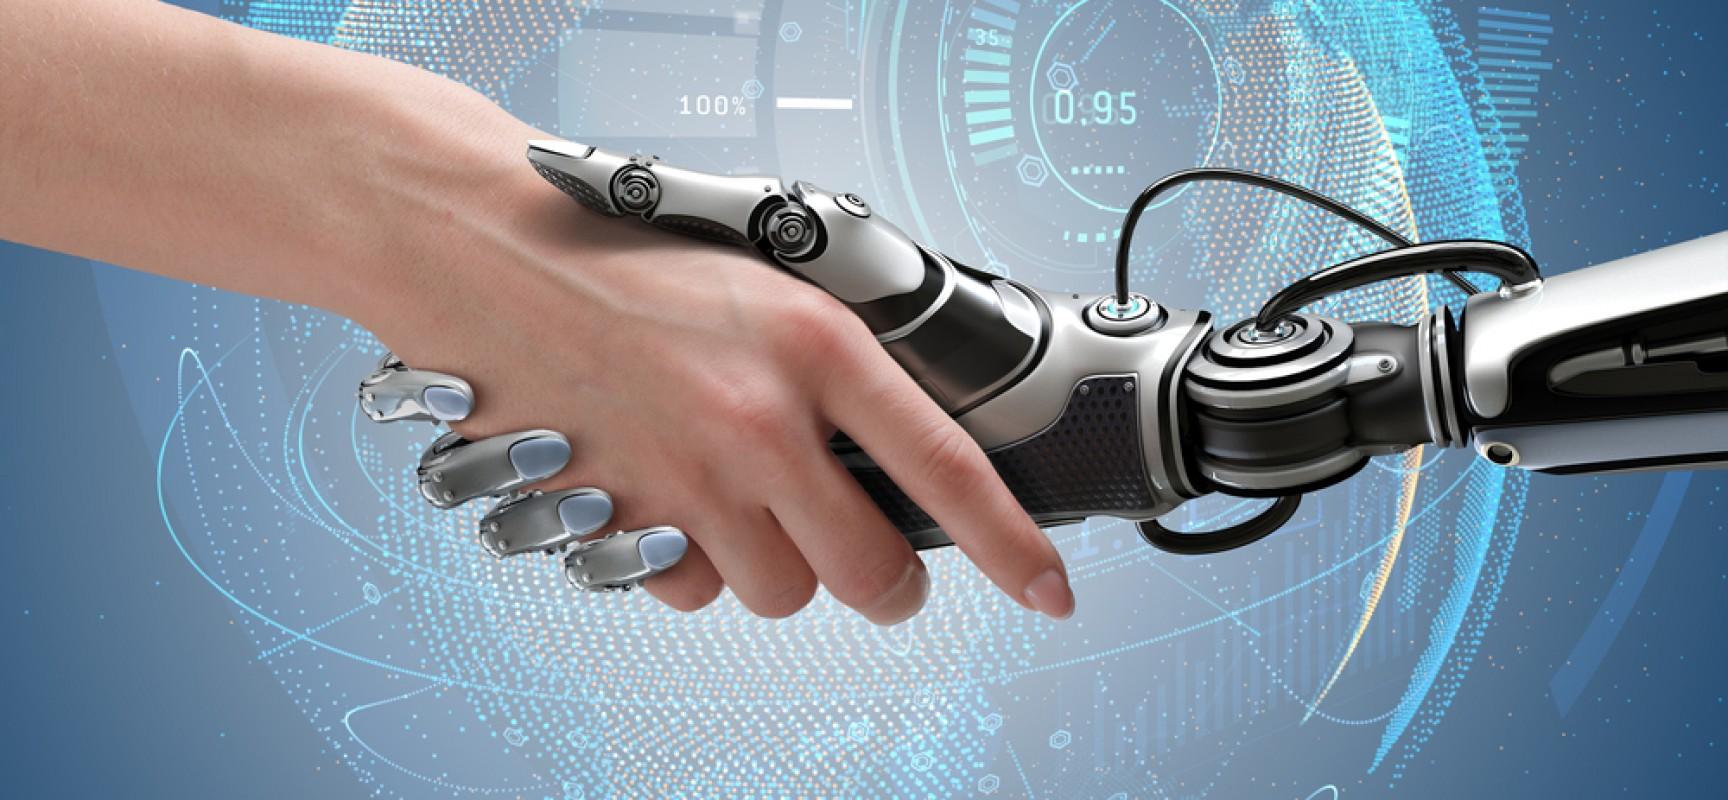 tecnología blockchain, estados unidos, inteligencia artificial, adopción de blockchain